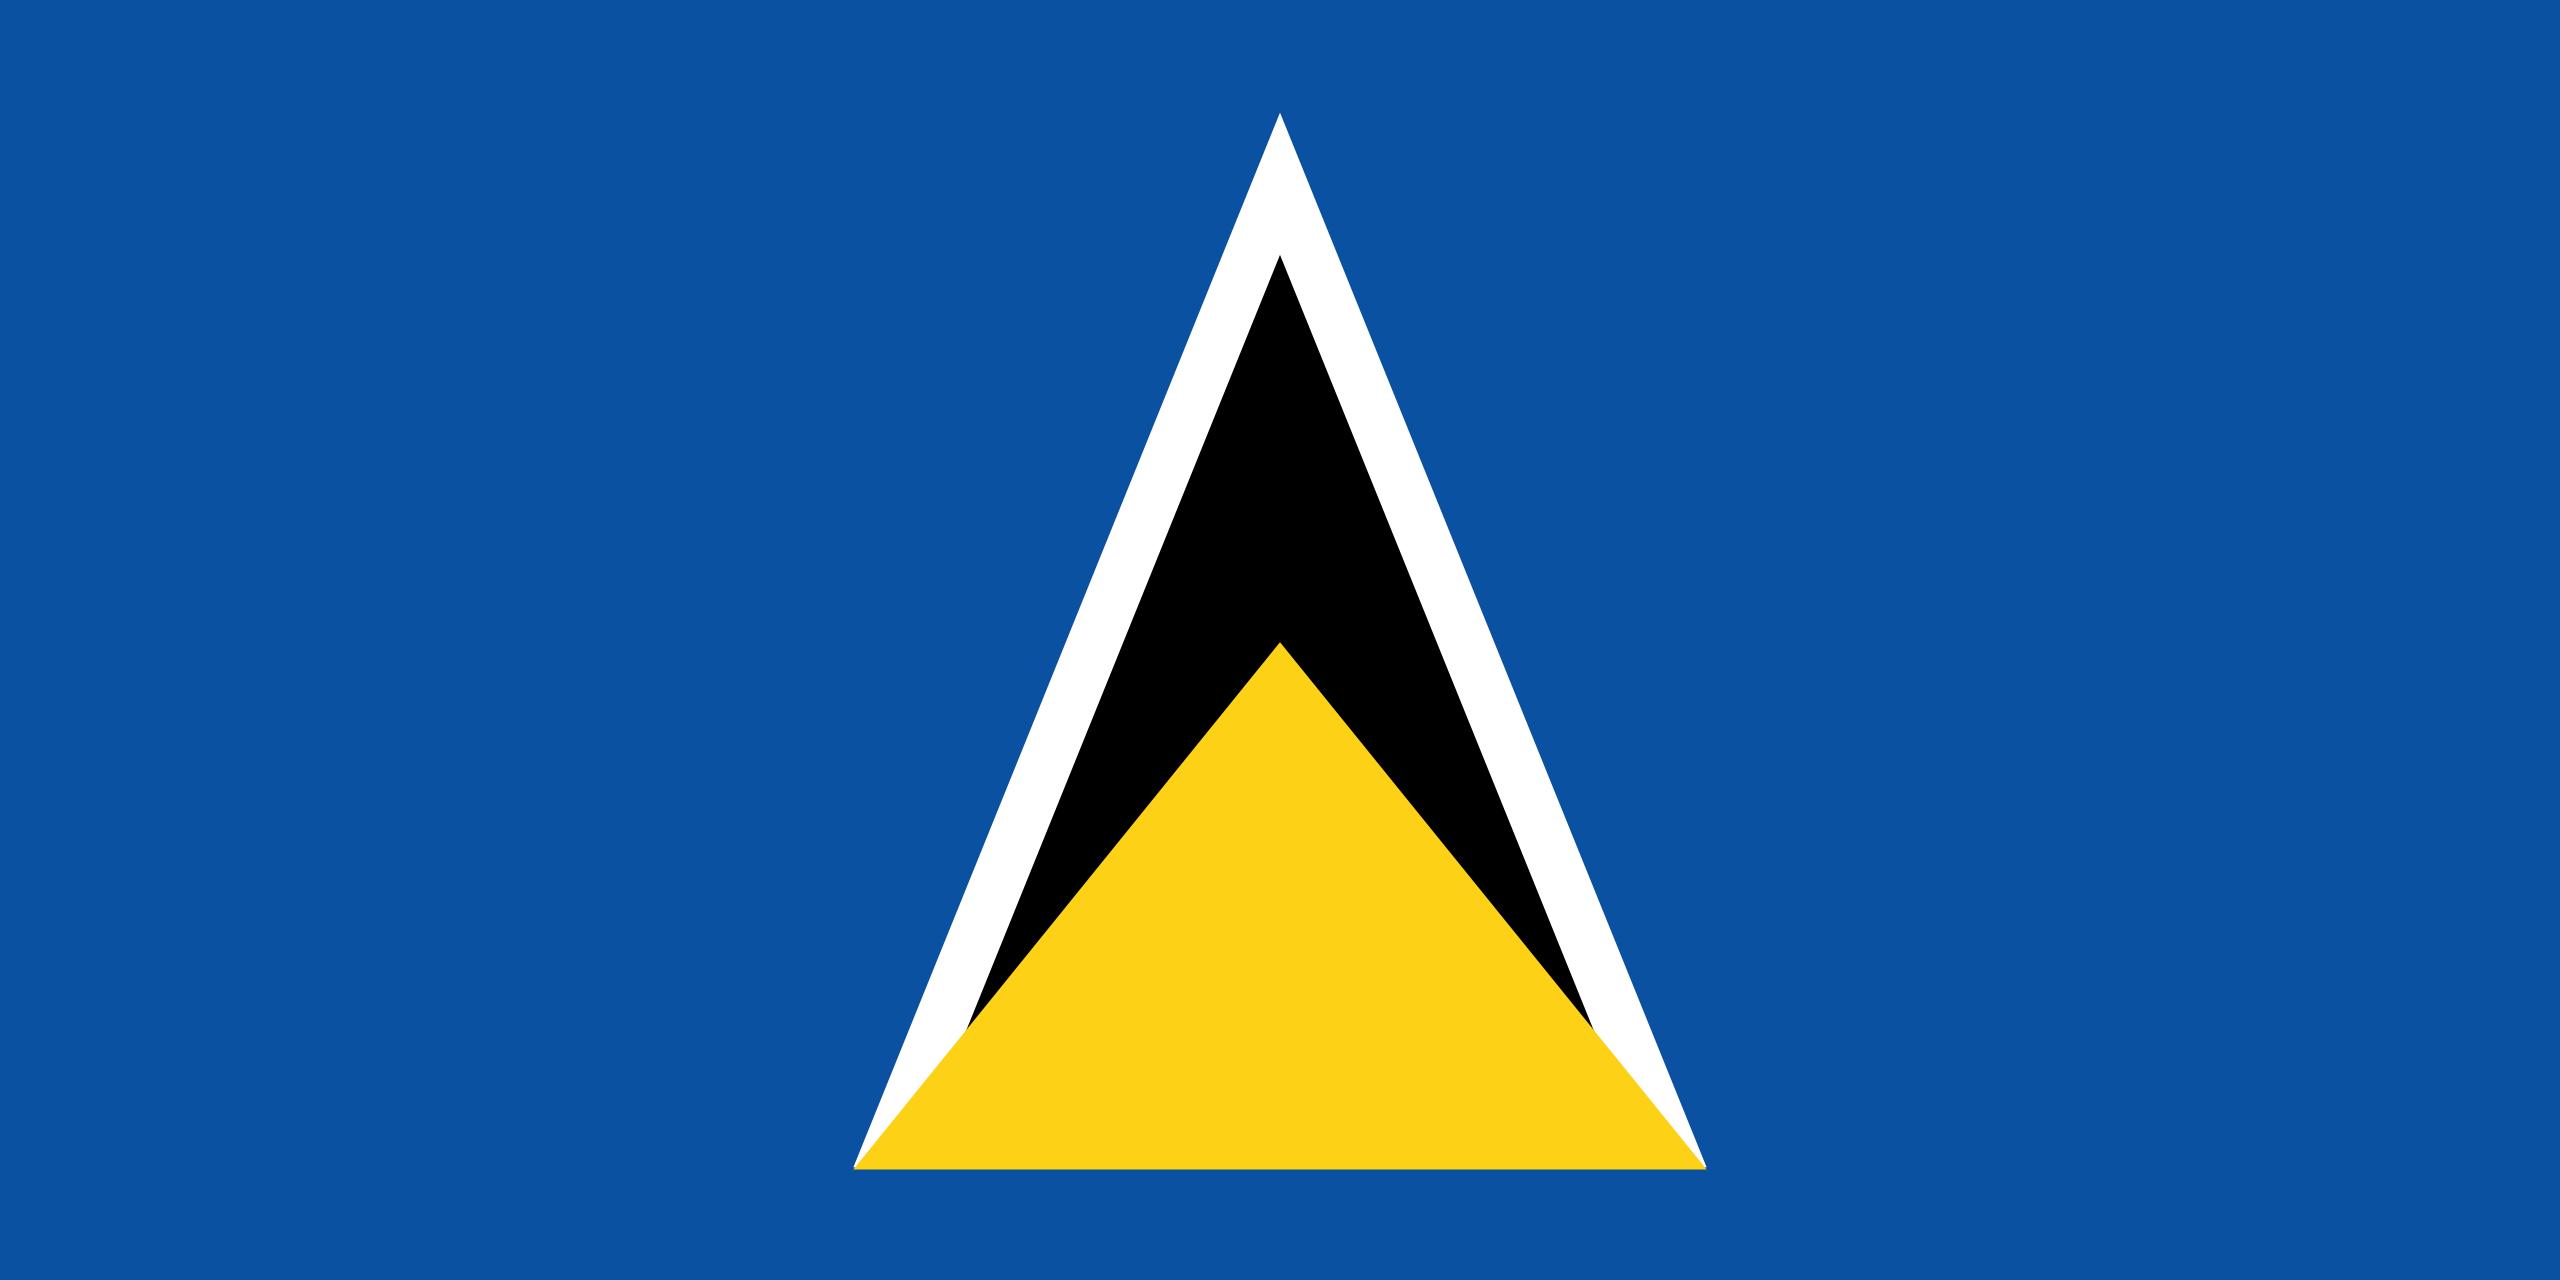 santa lucia, страна, Эмблема, логотип, символ - Обои HD - Профессор falken.com